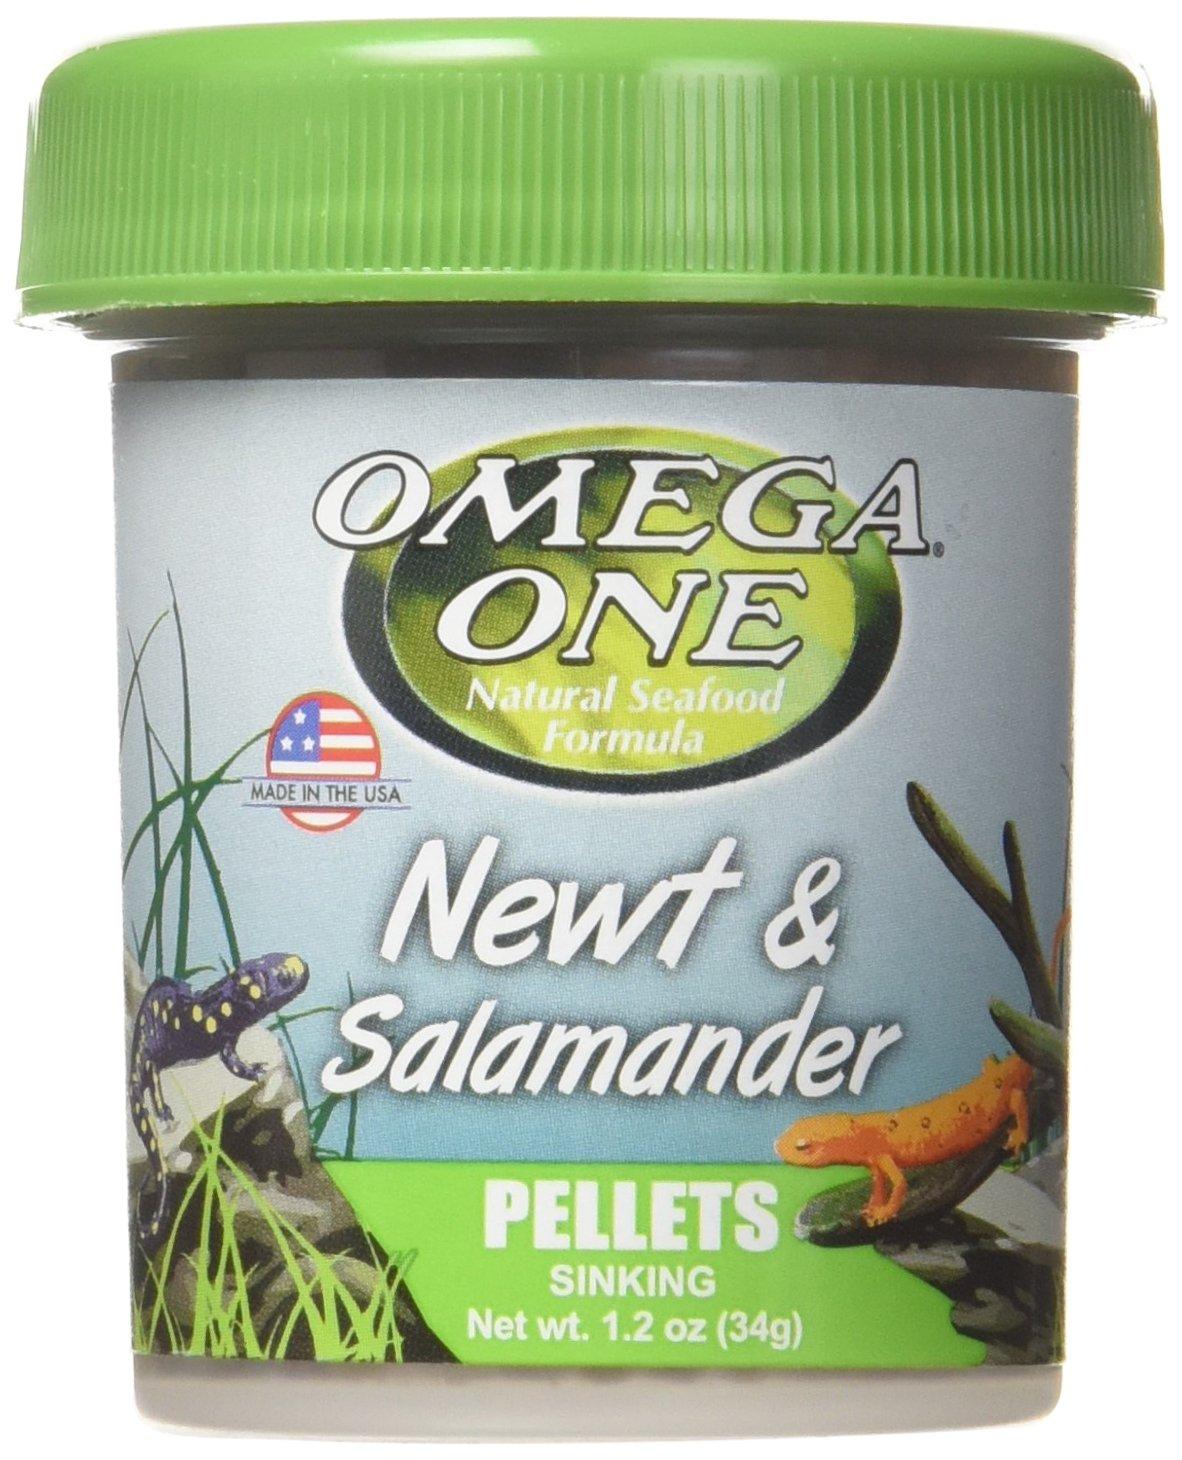 OmegaSea Food Os Newt and Salamander Pellets 1.2 oz, 1 Can, Small Lambert Vet Supply 63111